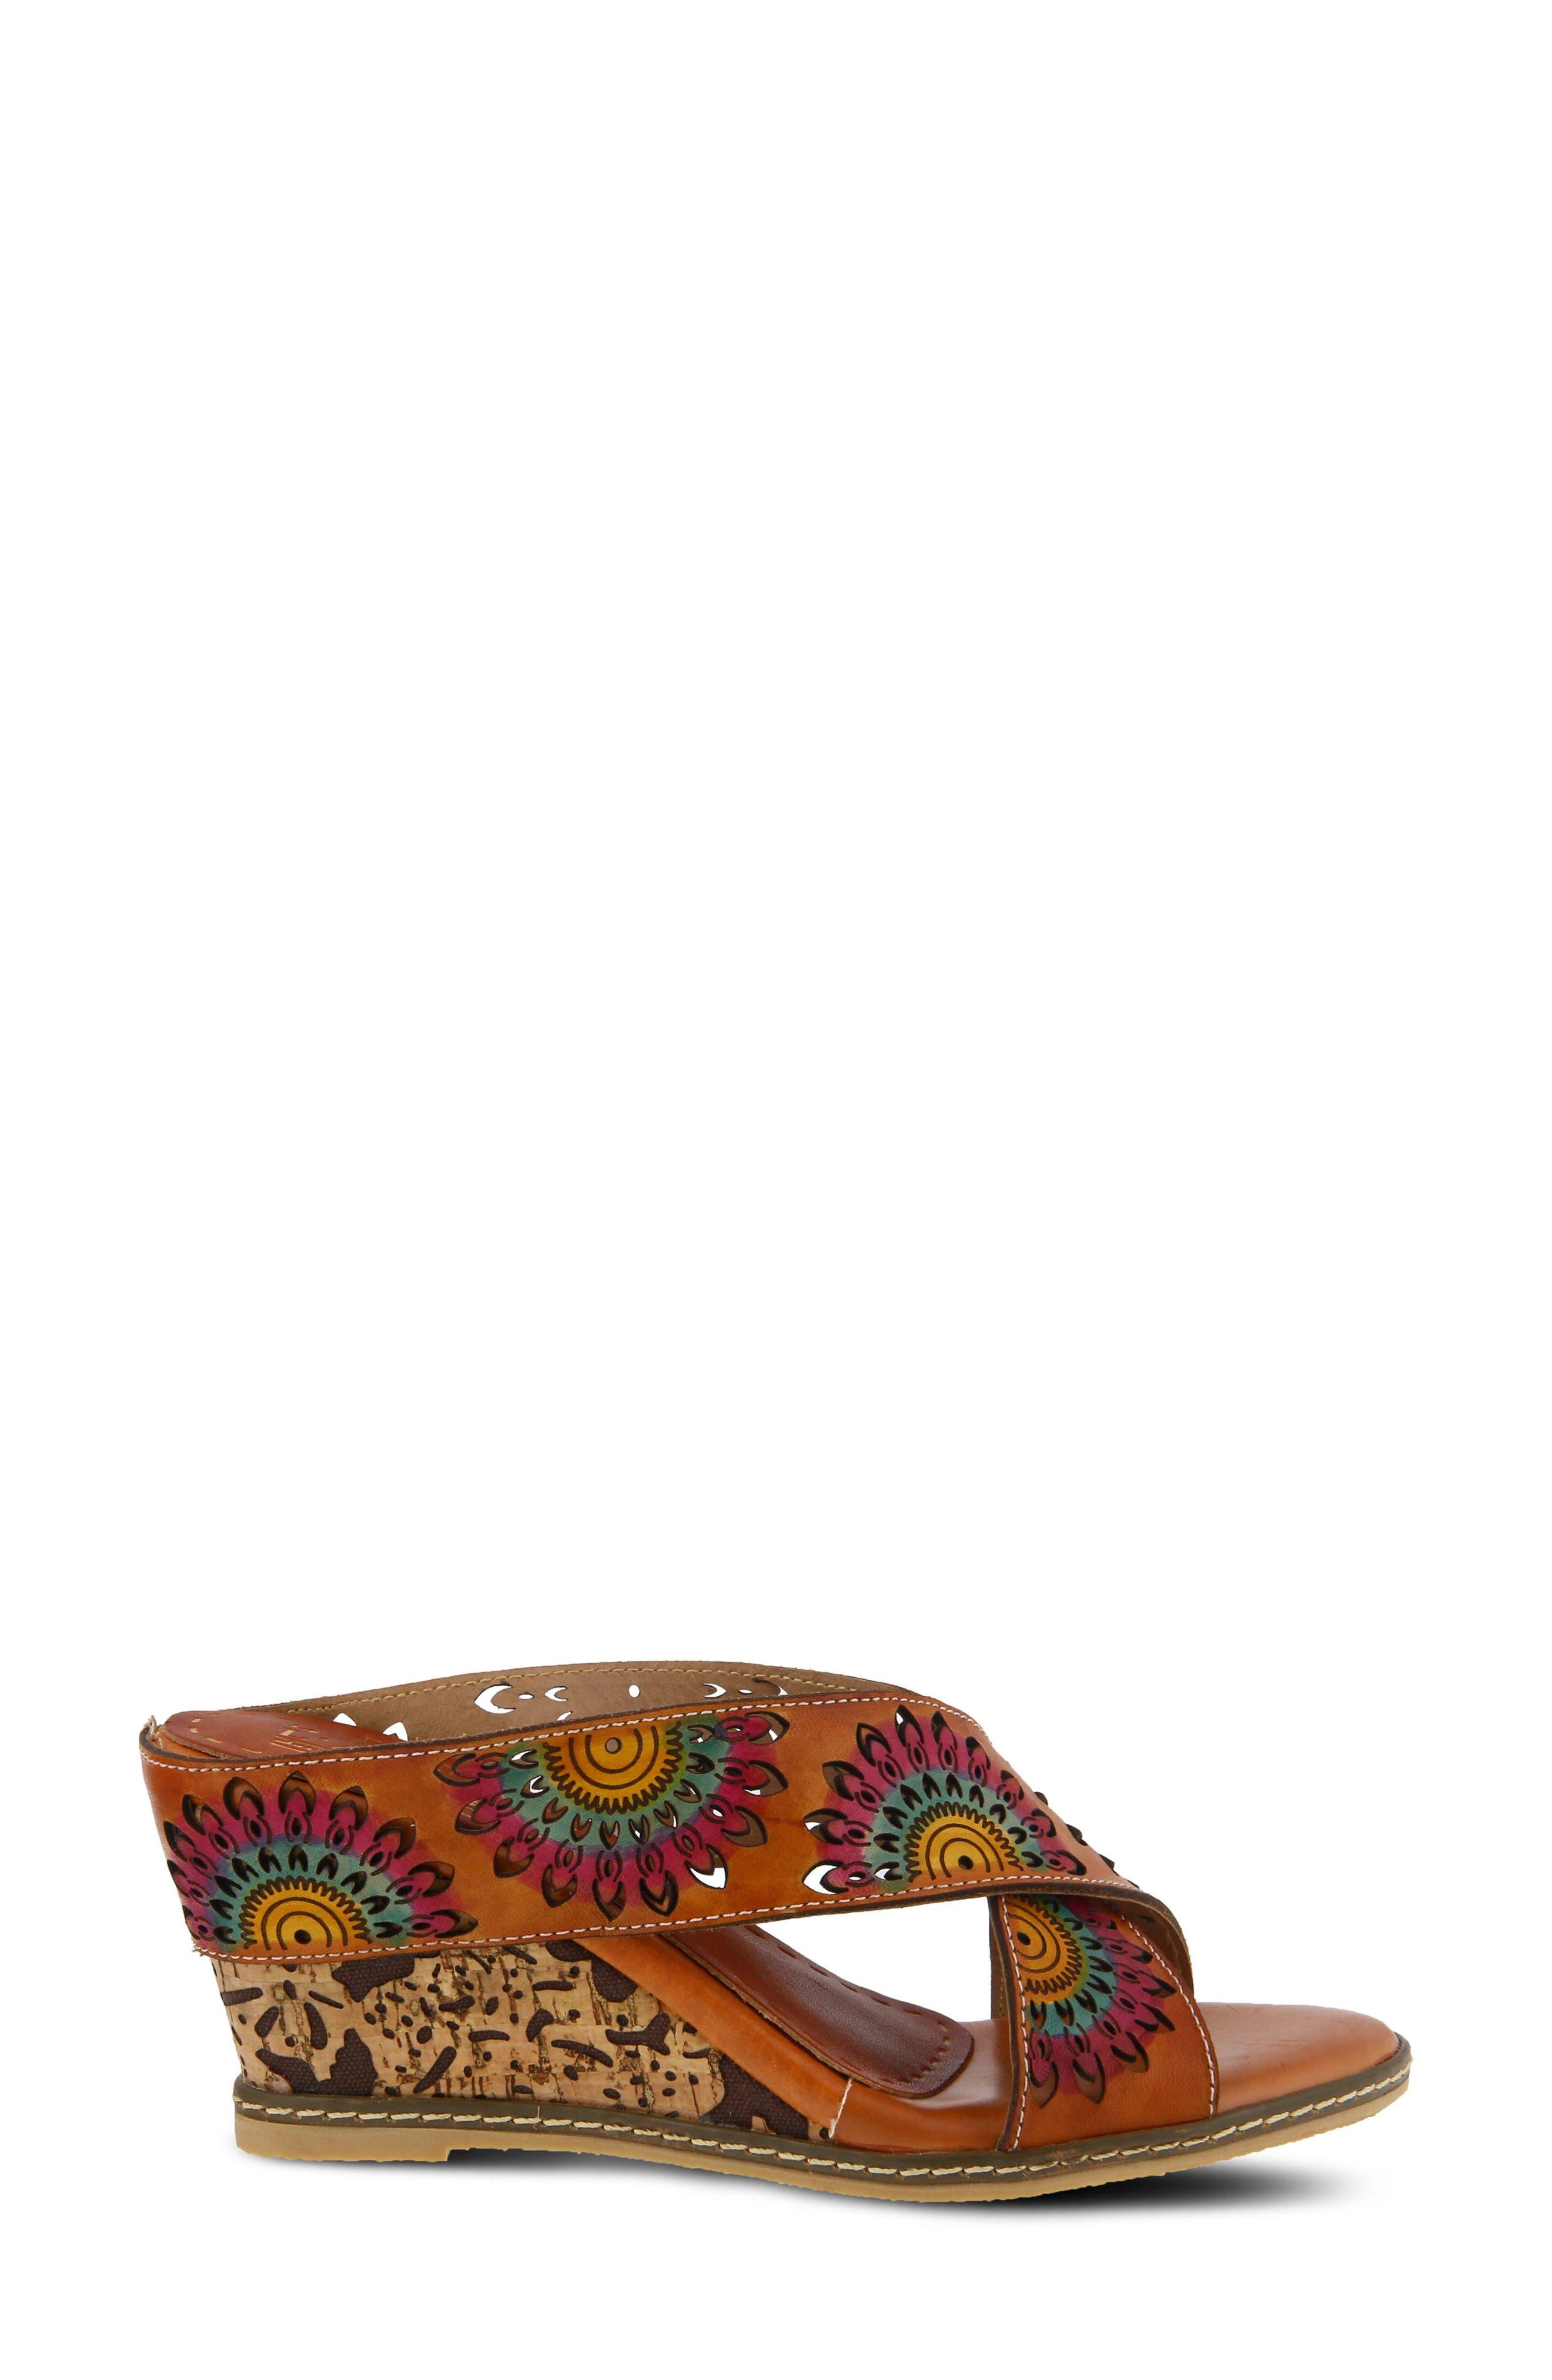 L'Artiste Enticing Wedge Sandal,                             Alternate thumbnail 3, color,                             CAMEL LEATHER